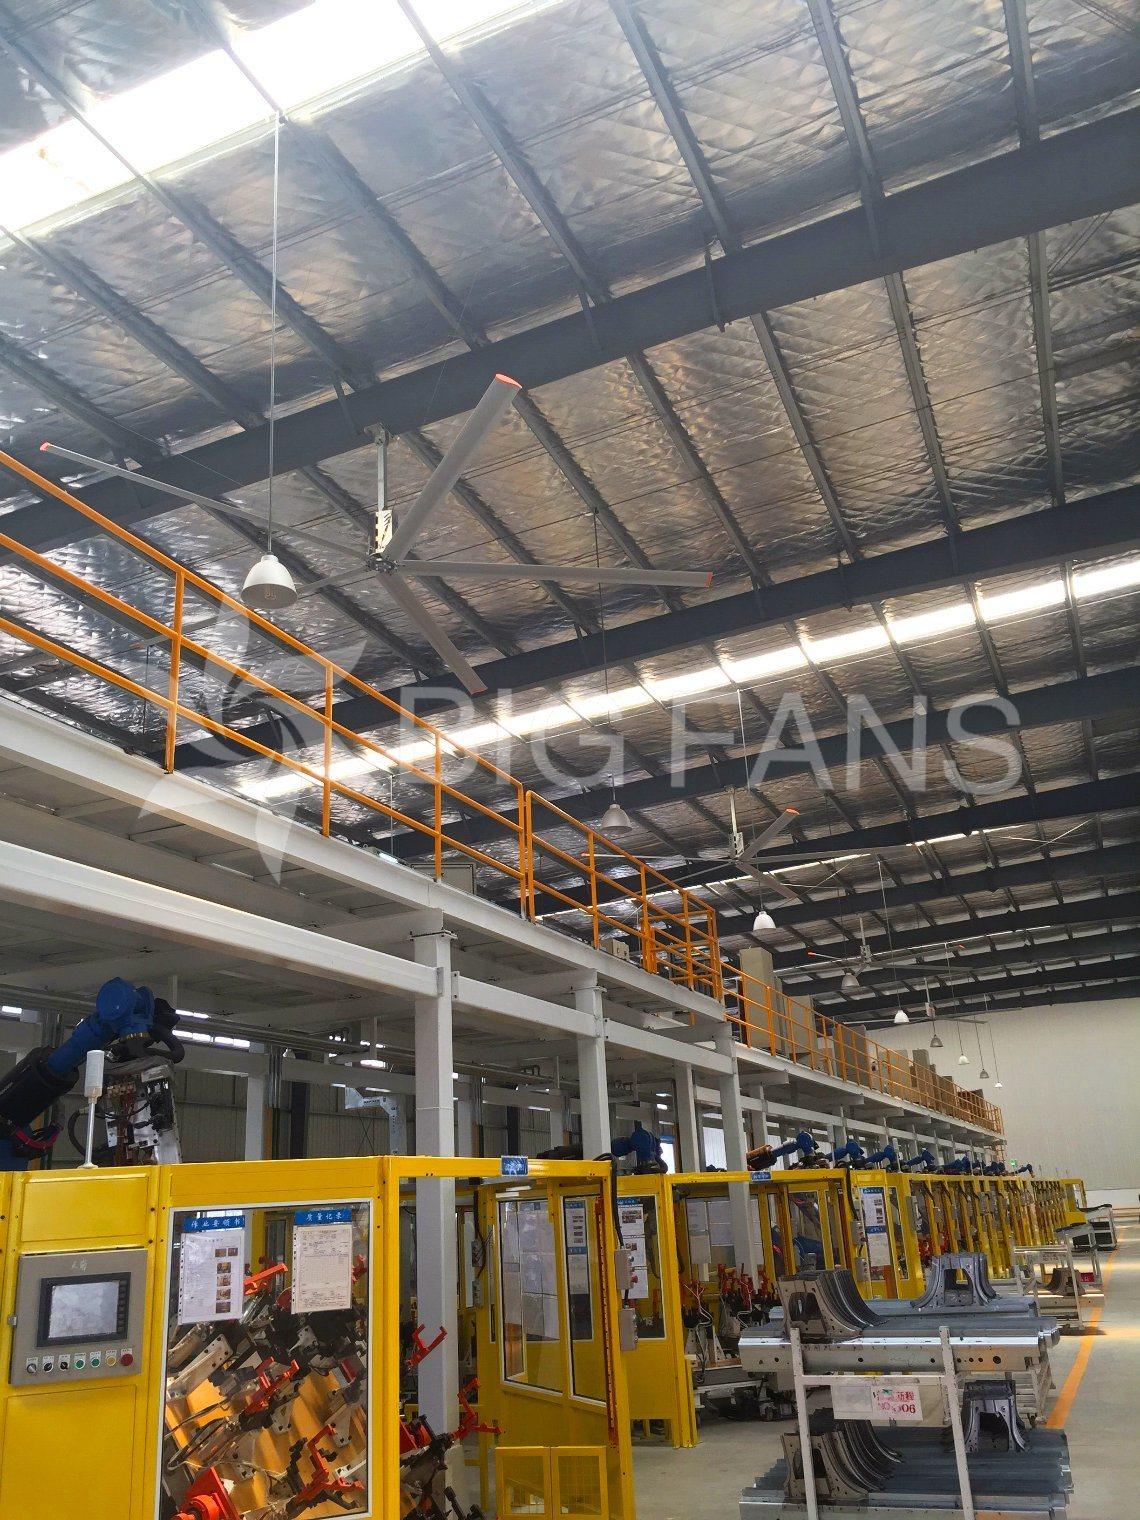 Large Ceiling Fan Hvls Automatic Industrial Giant Ceiling Fan / Fan of Ceiling/7.4m (24.3FT)